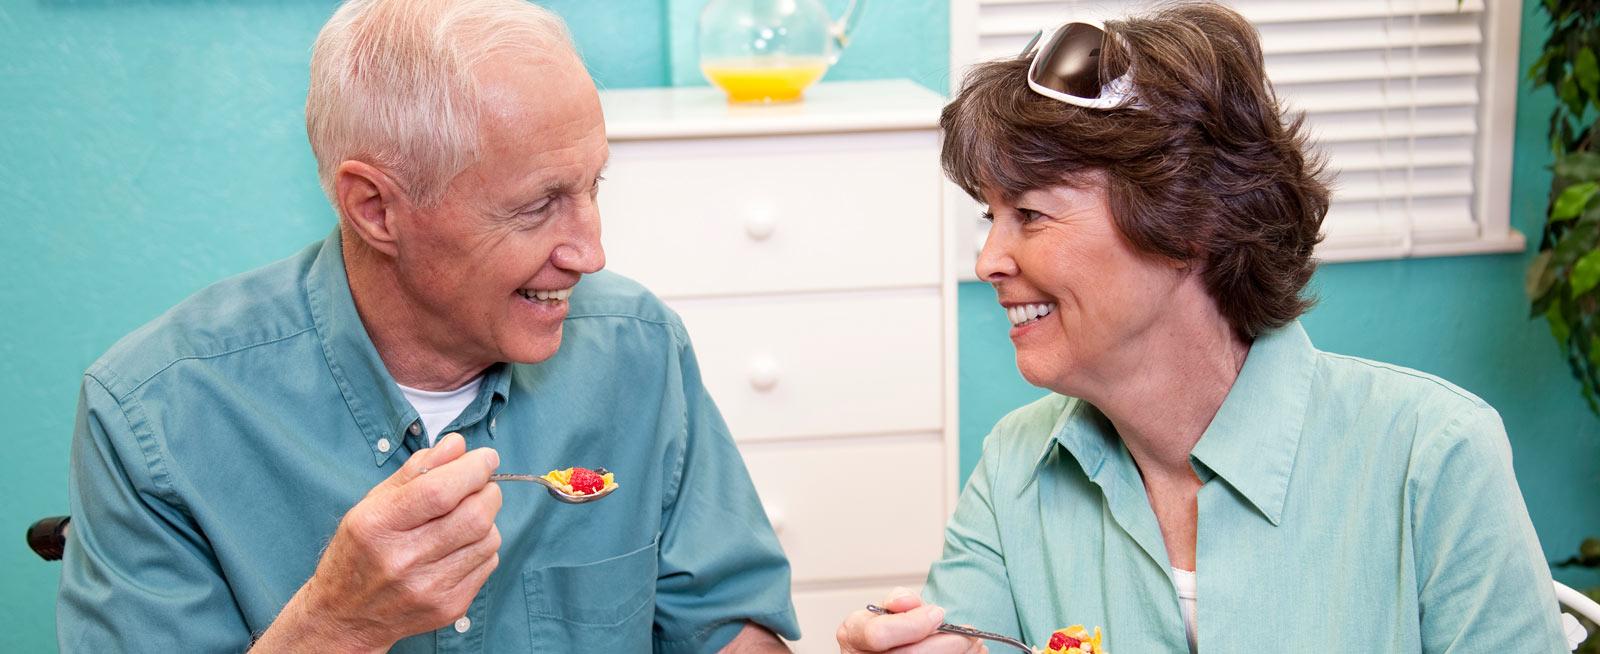 vrs seniors eating a meal